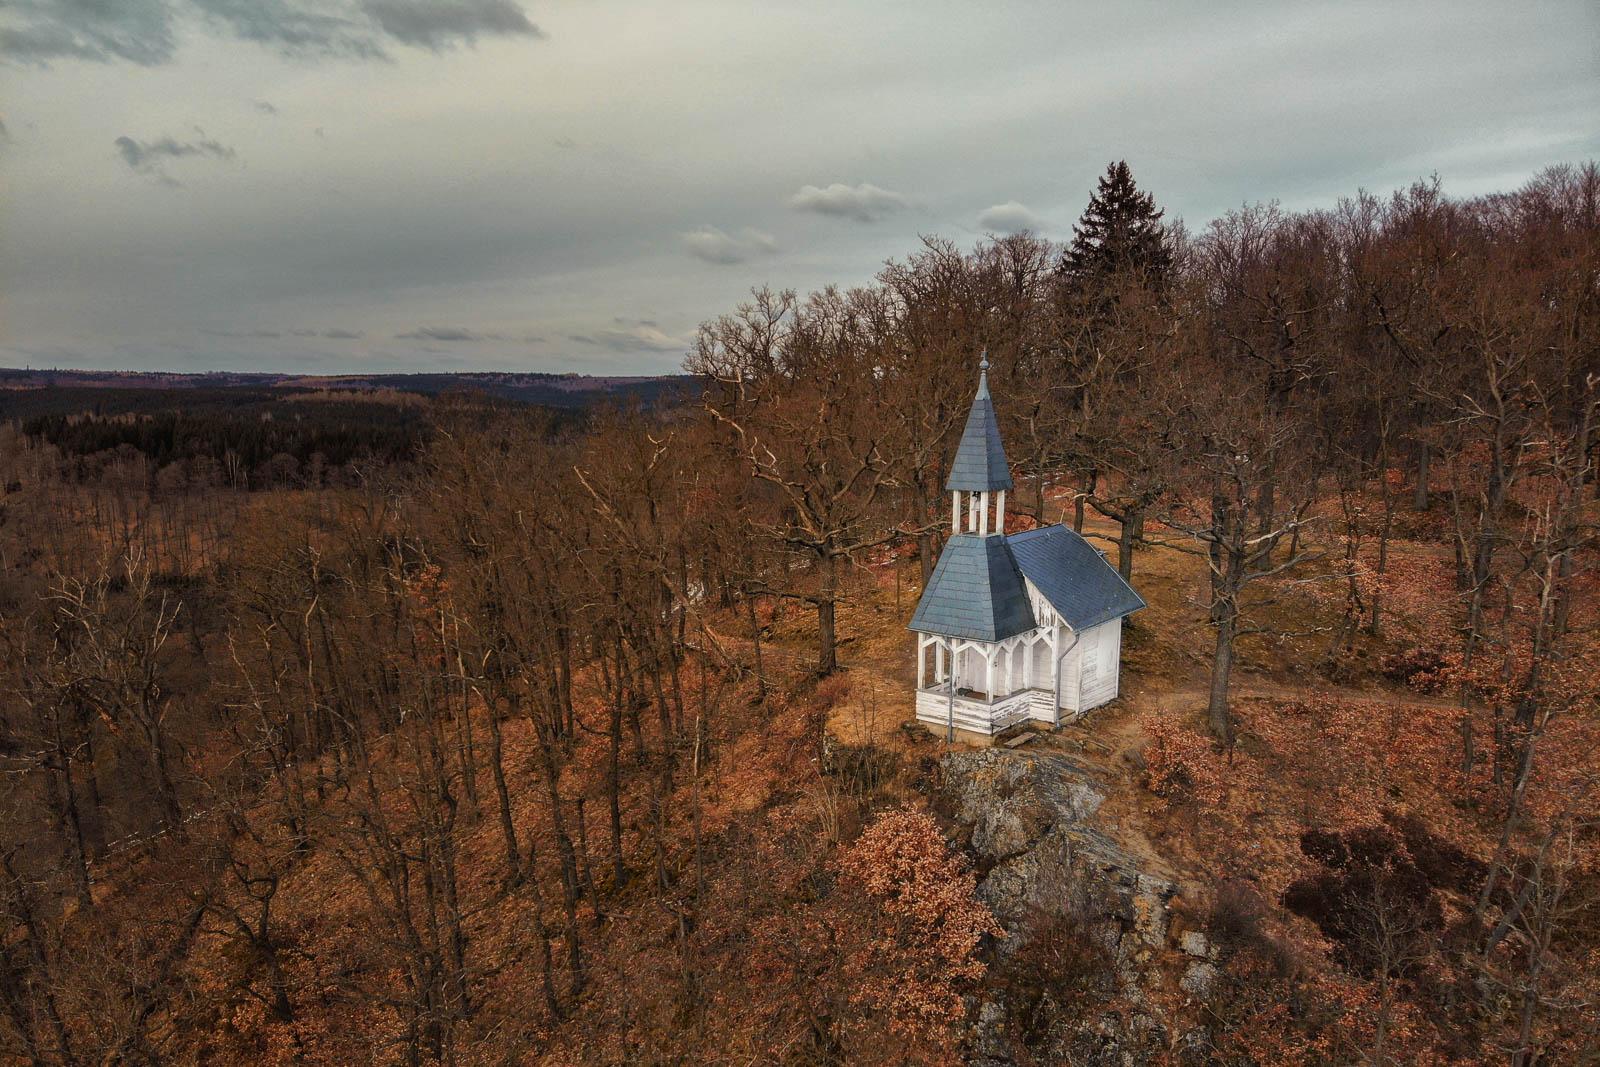 Die Köthener Hütte nahe Mägdesprung